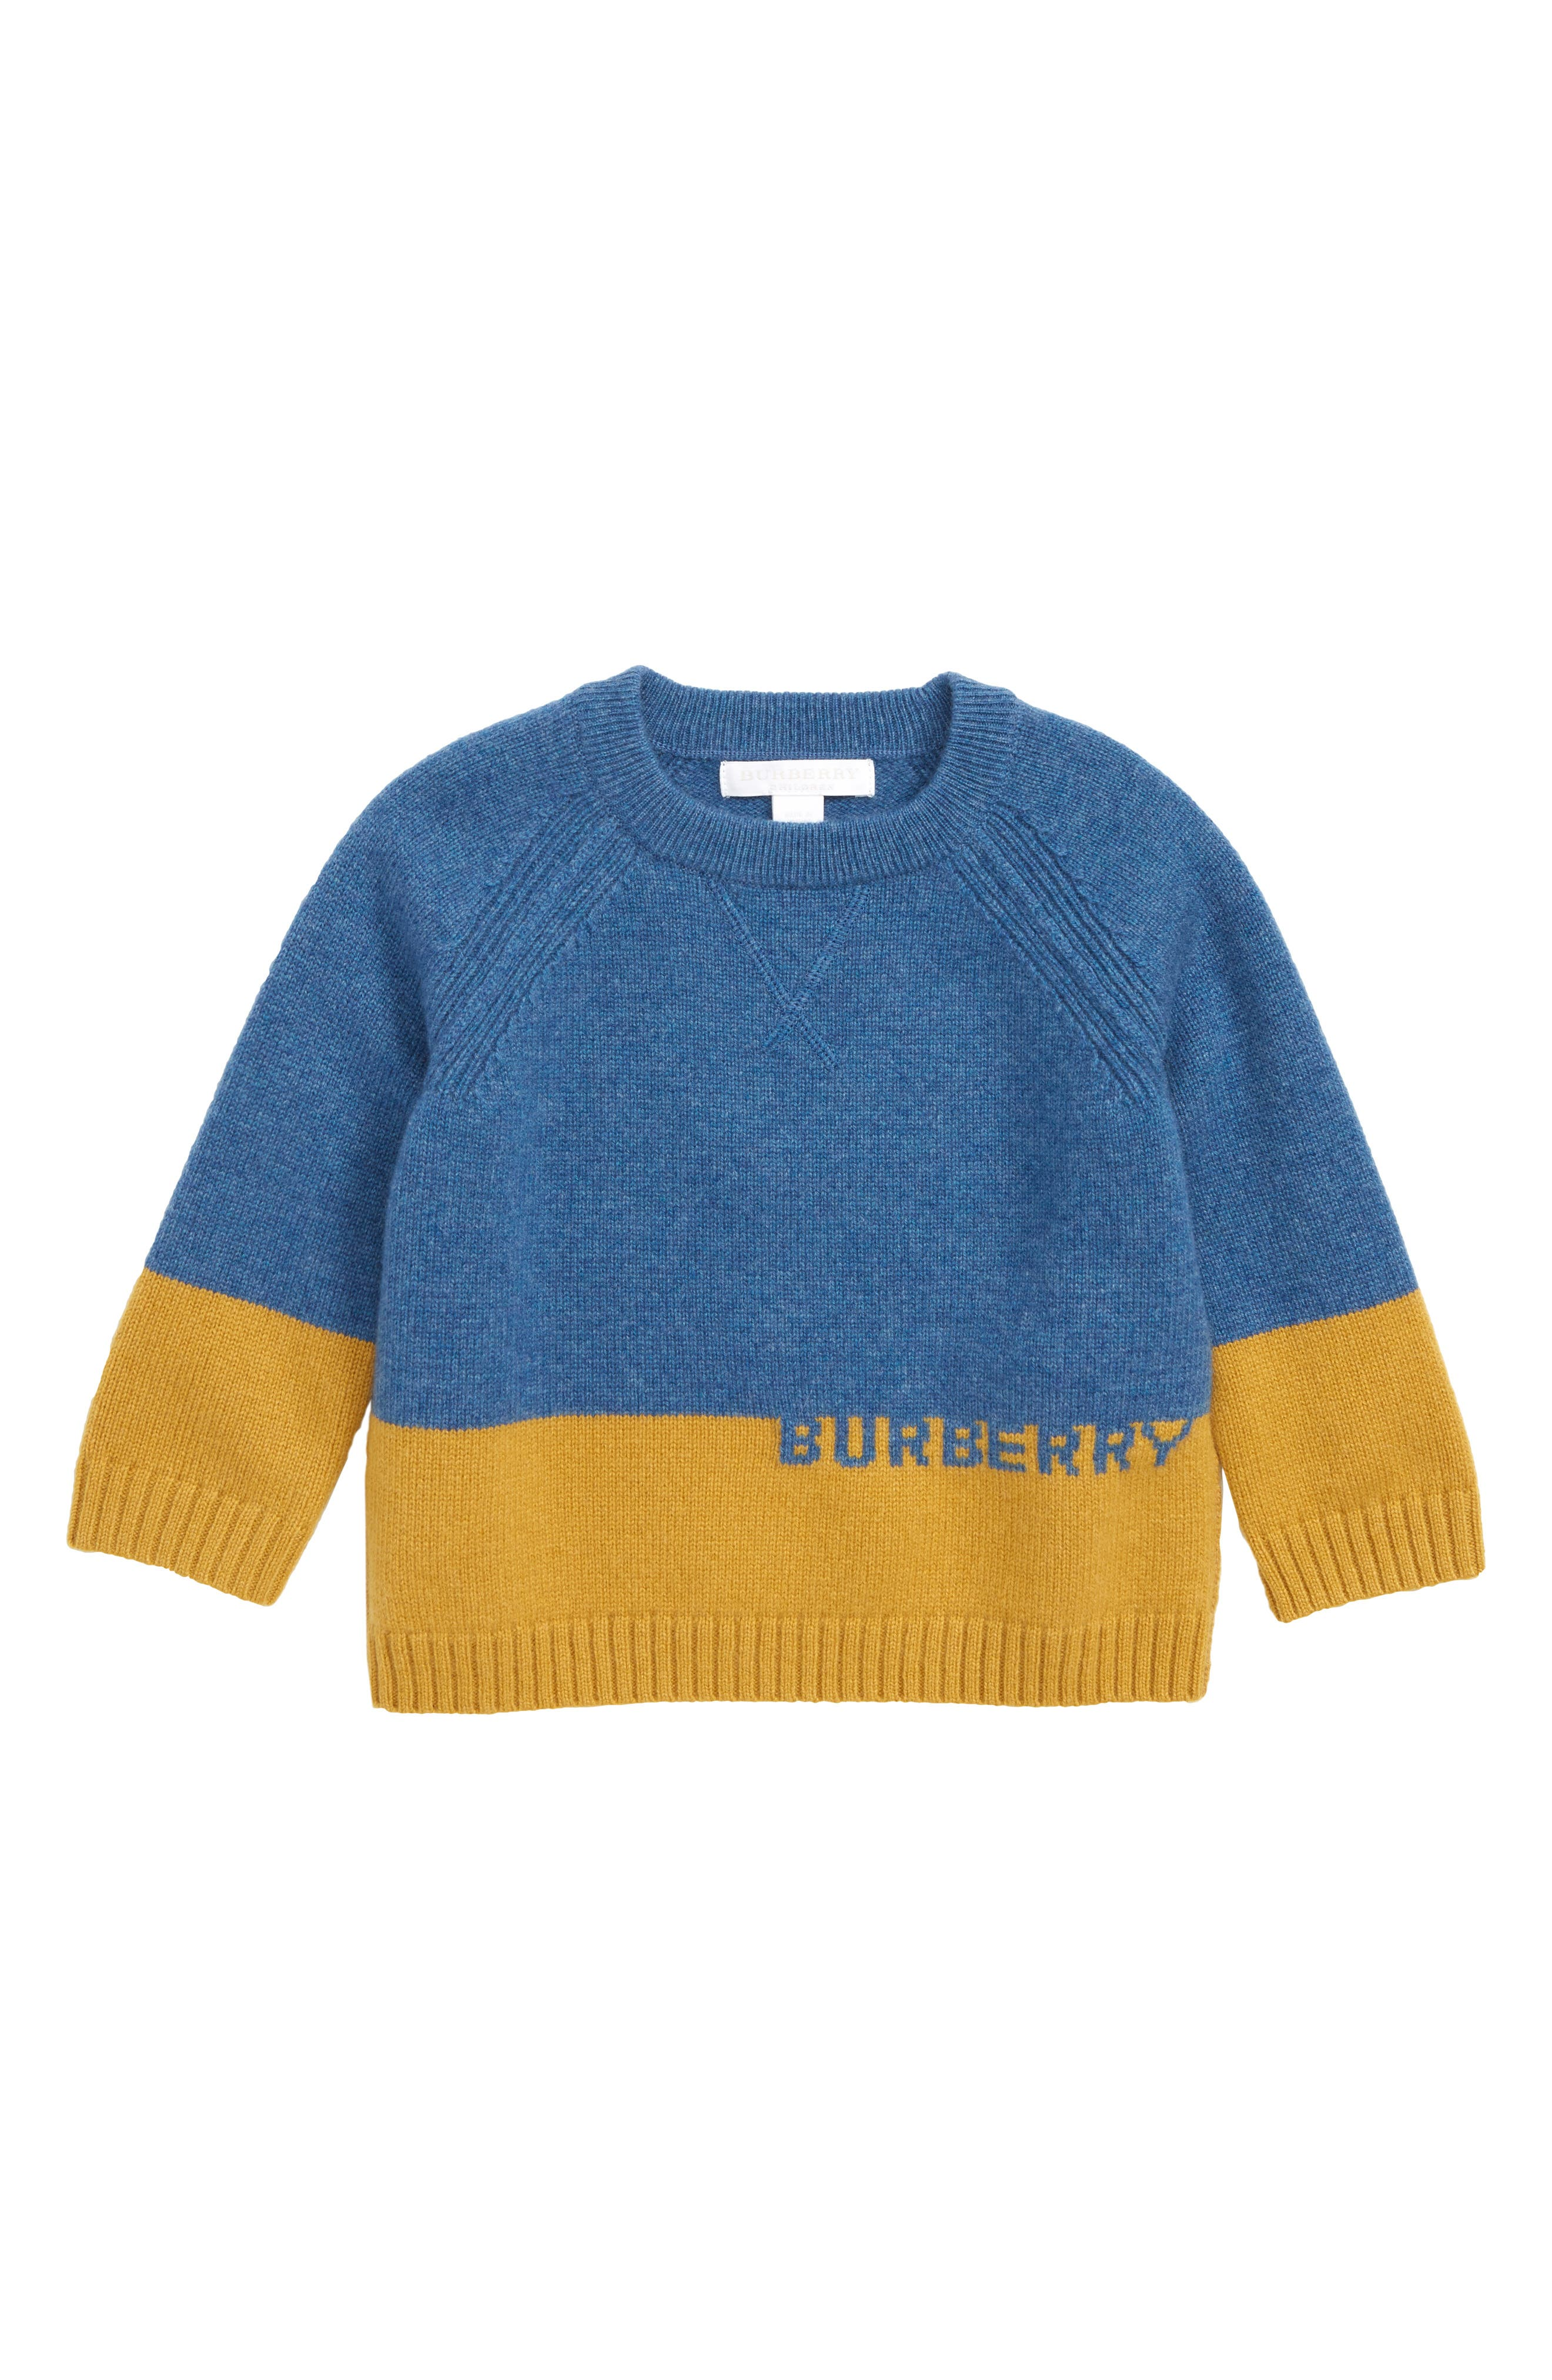 BURBERRY Alister Cashmere Sweater, Main, color, DUSTY BLUE MELANGE